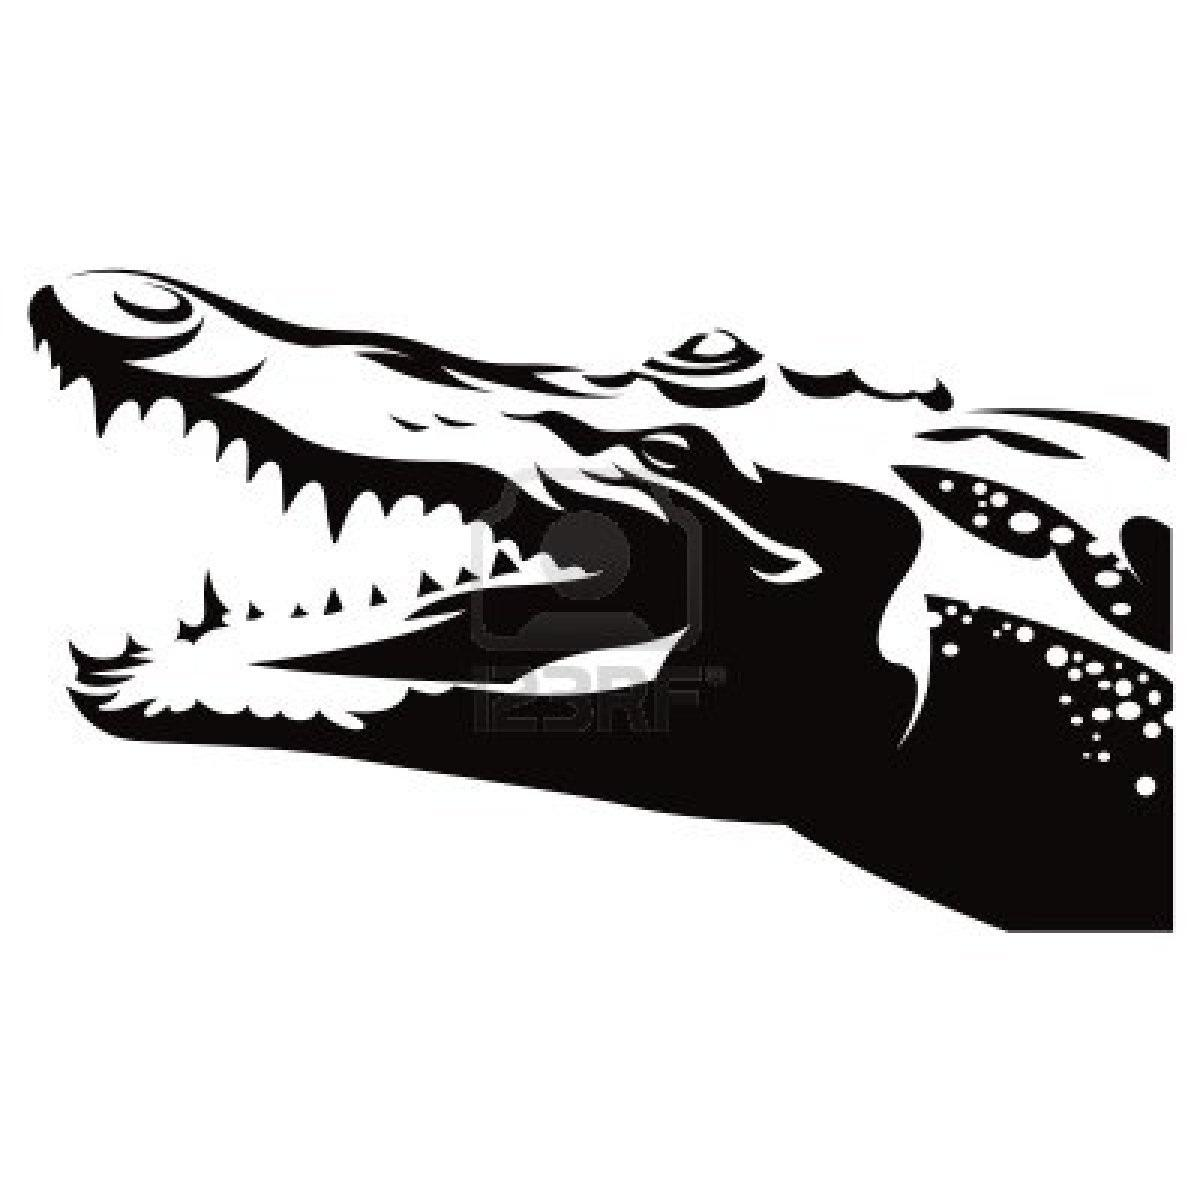 35+ Awesome Alligator Tattoo Designs